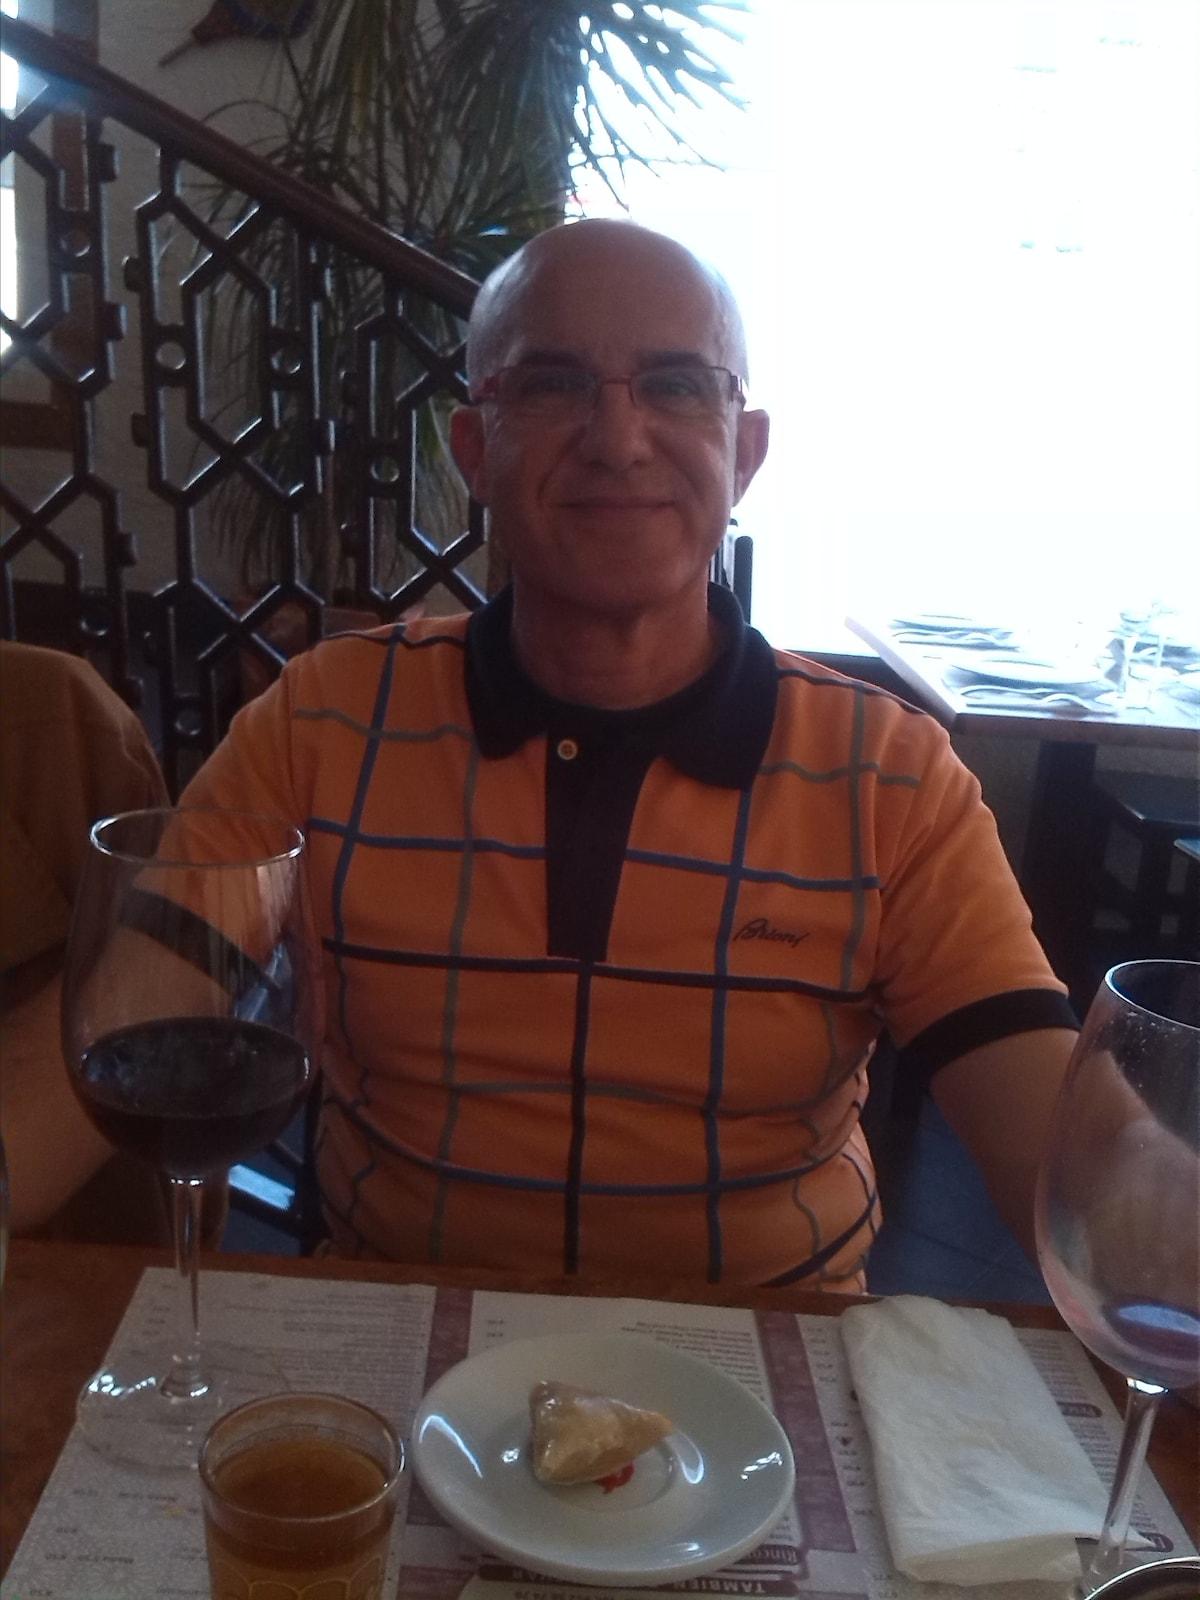 Jose Pedro From Torremolinos, Spain